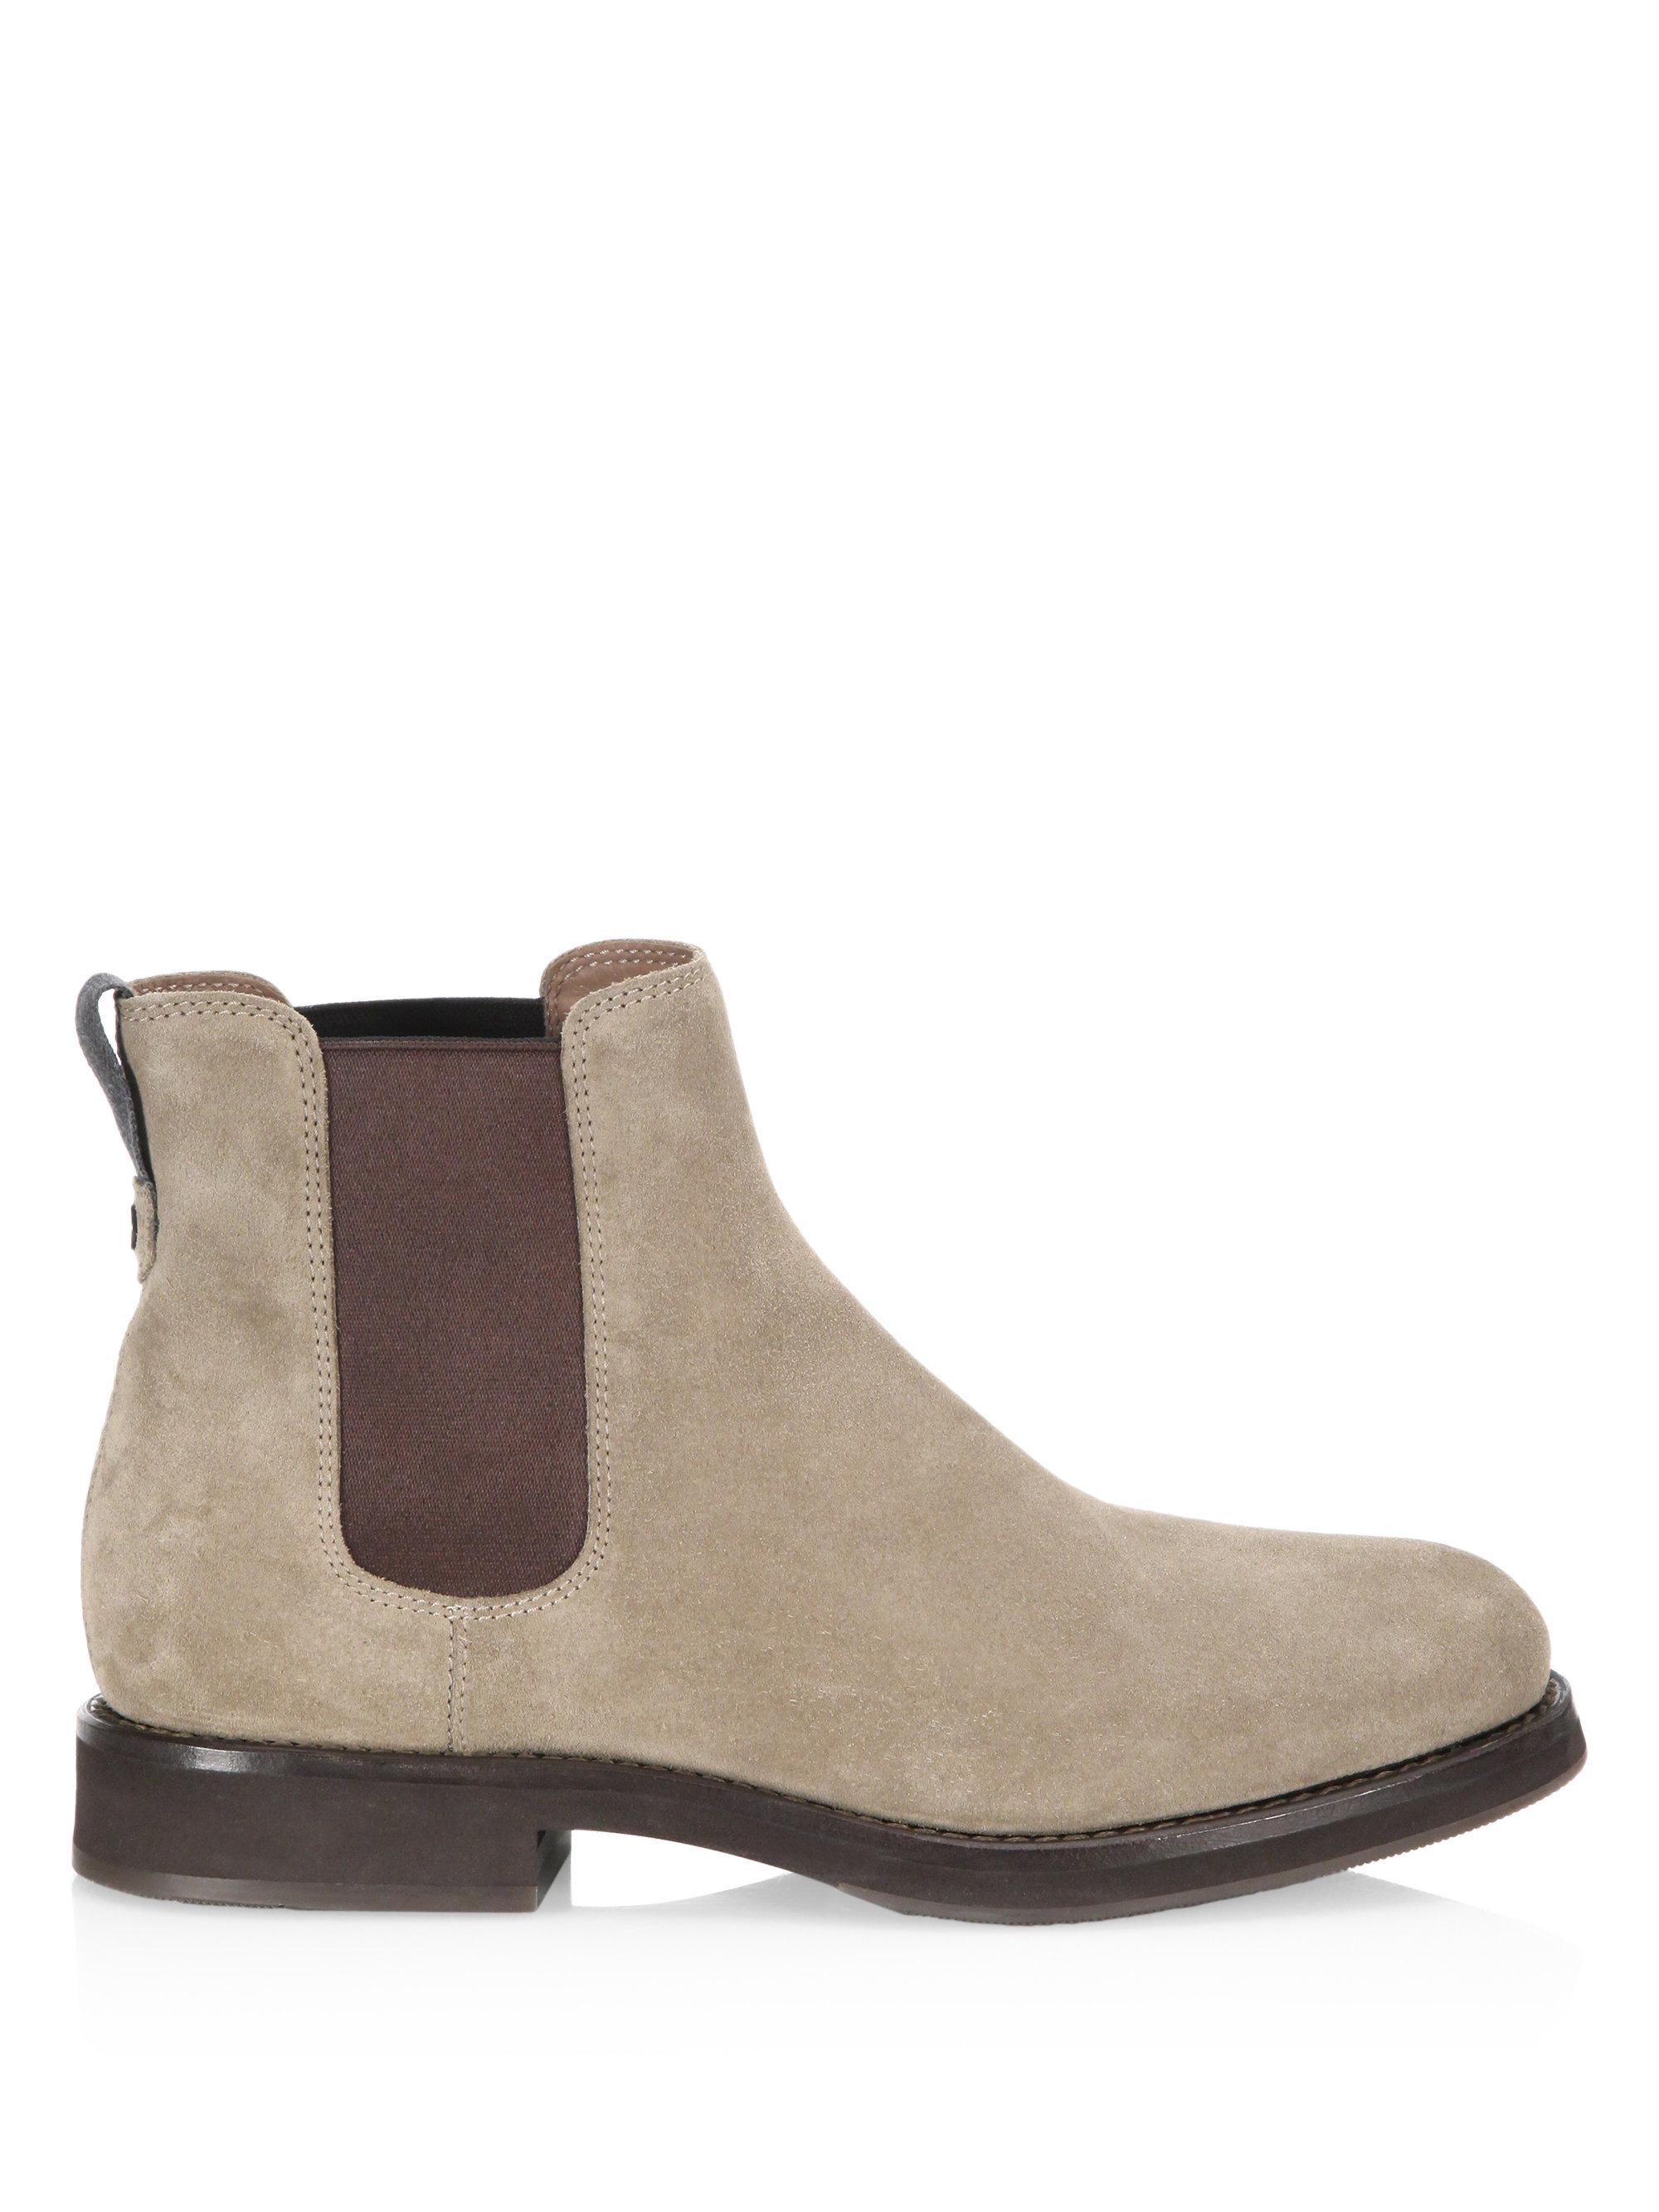 Brunello Cucinelli Two-Tone Suede Chelsea Boots xwhwsKTX